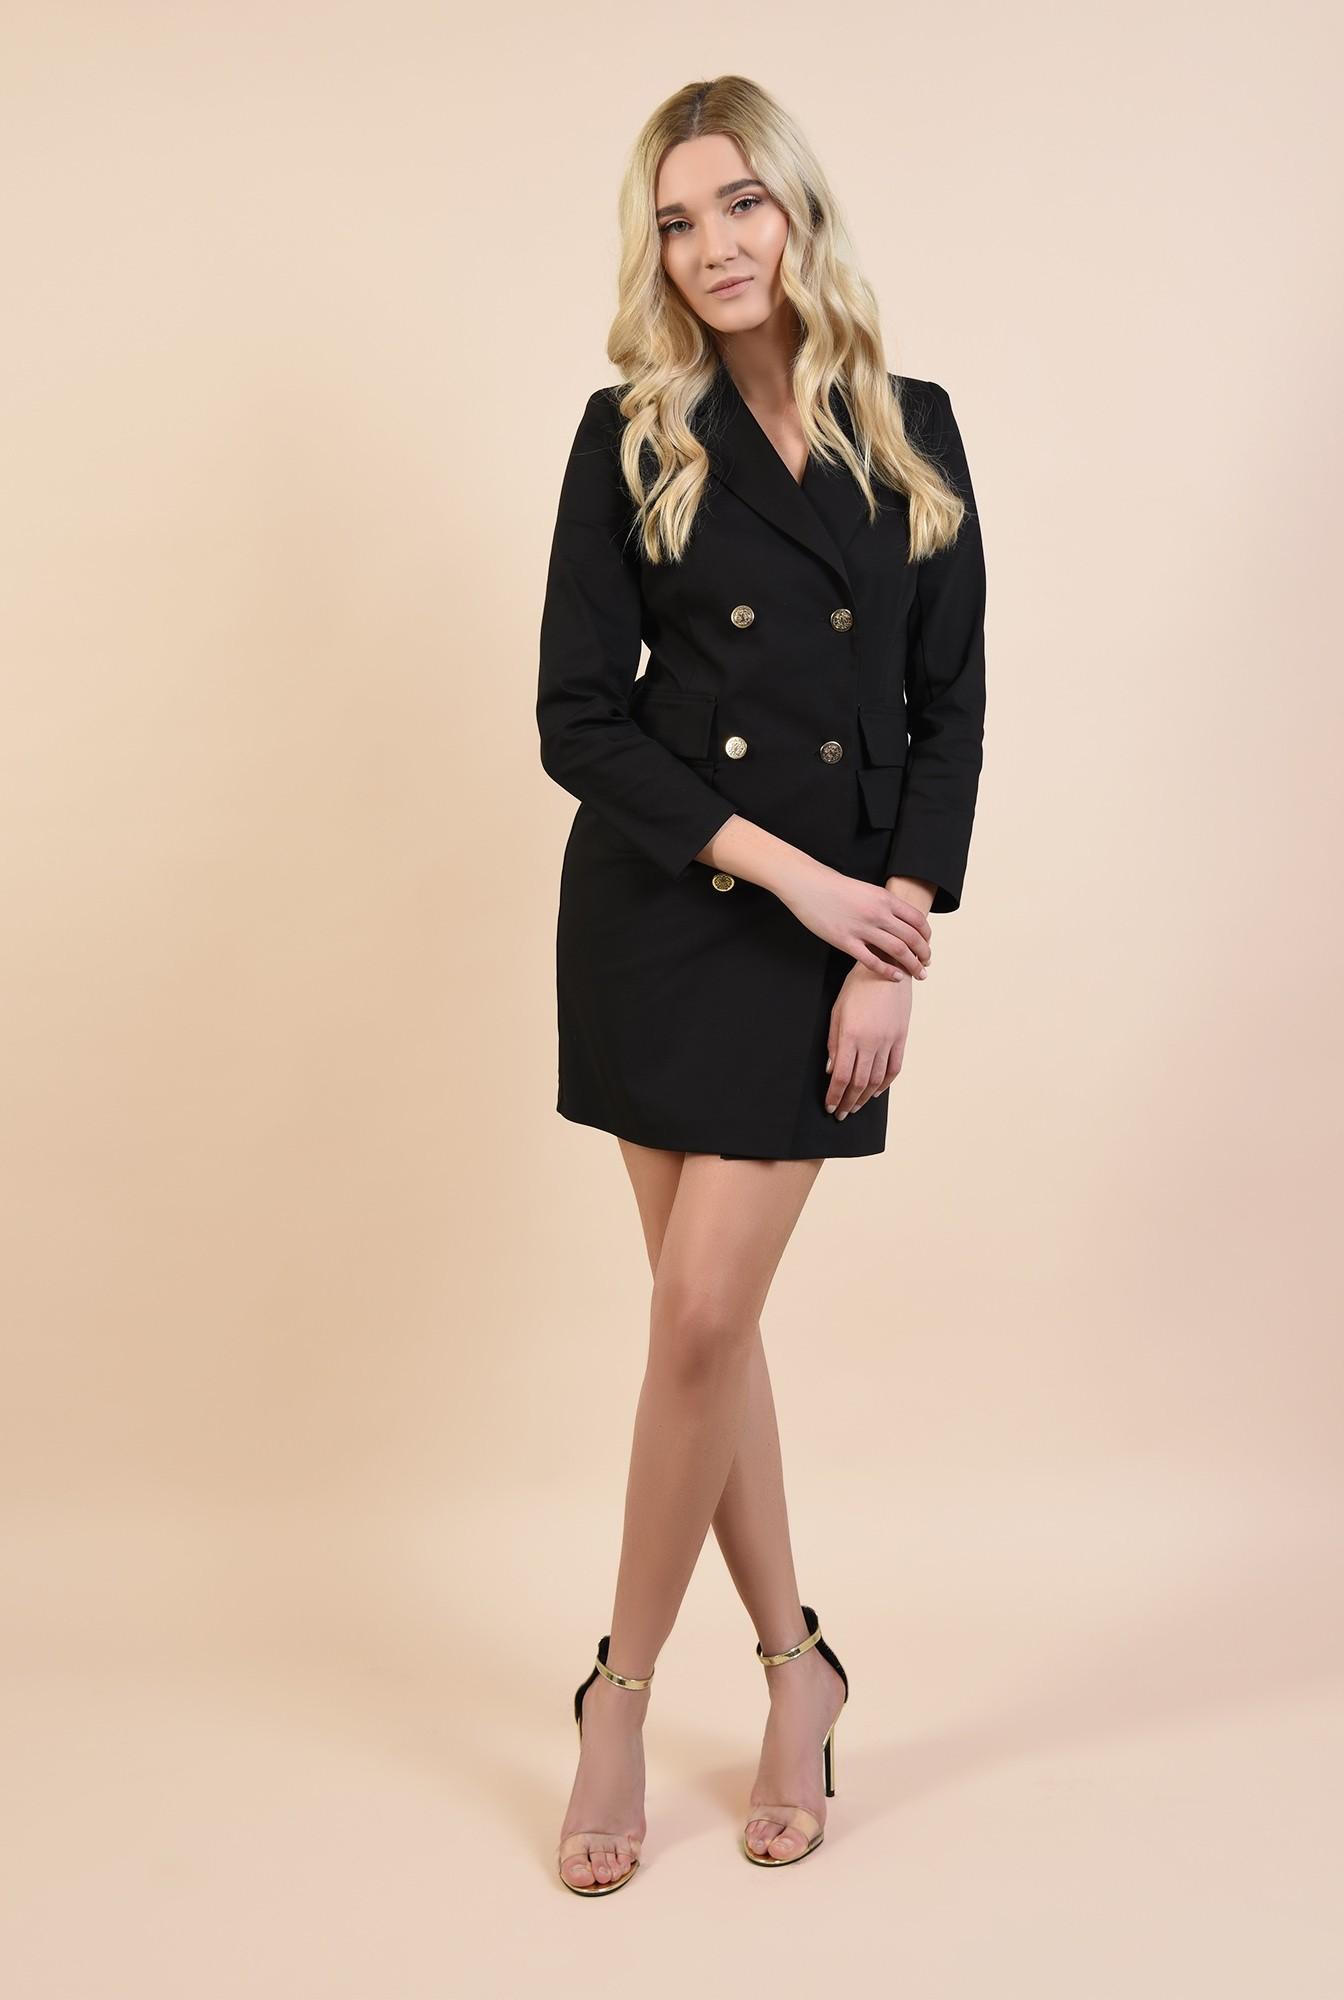 3 - rochie sacou, neagra, scurta, cambrata, rochie de ocazie